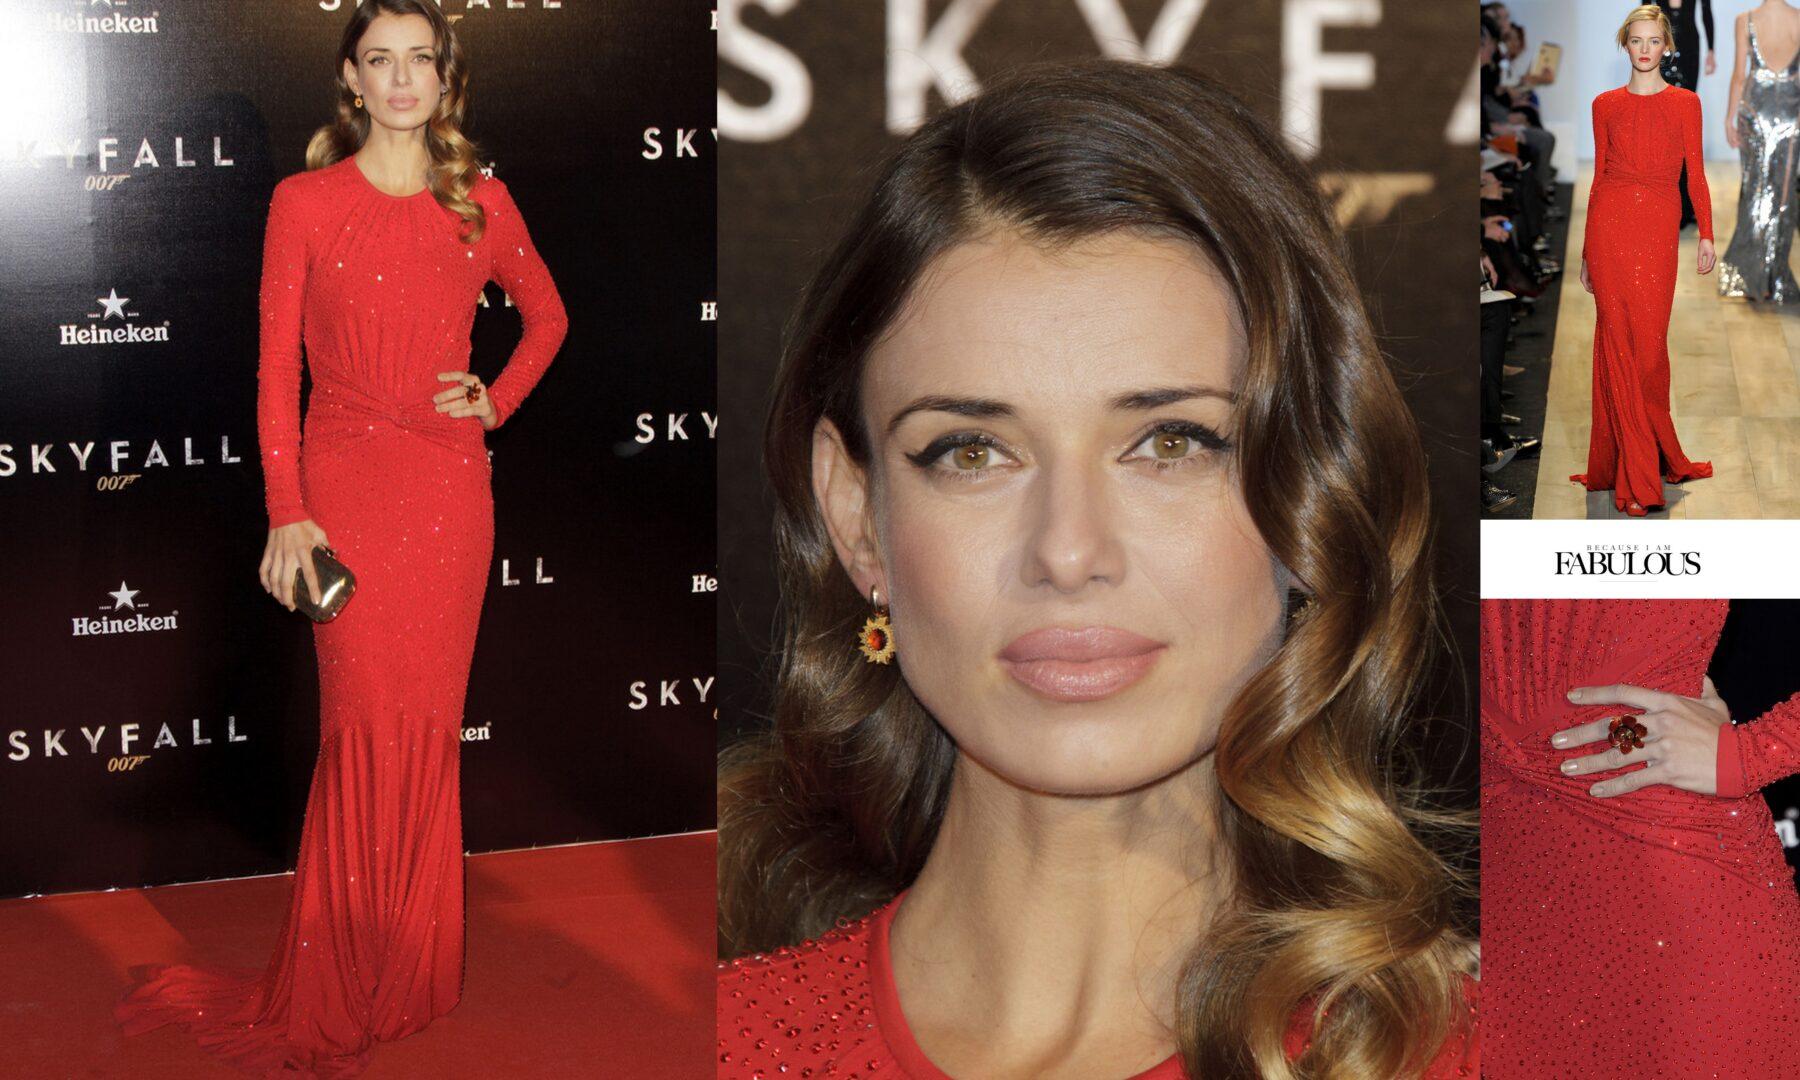 Entrevista con Natasha Yarovenko, actriz.